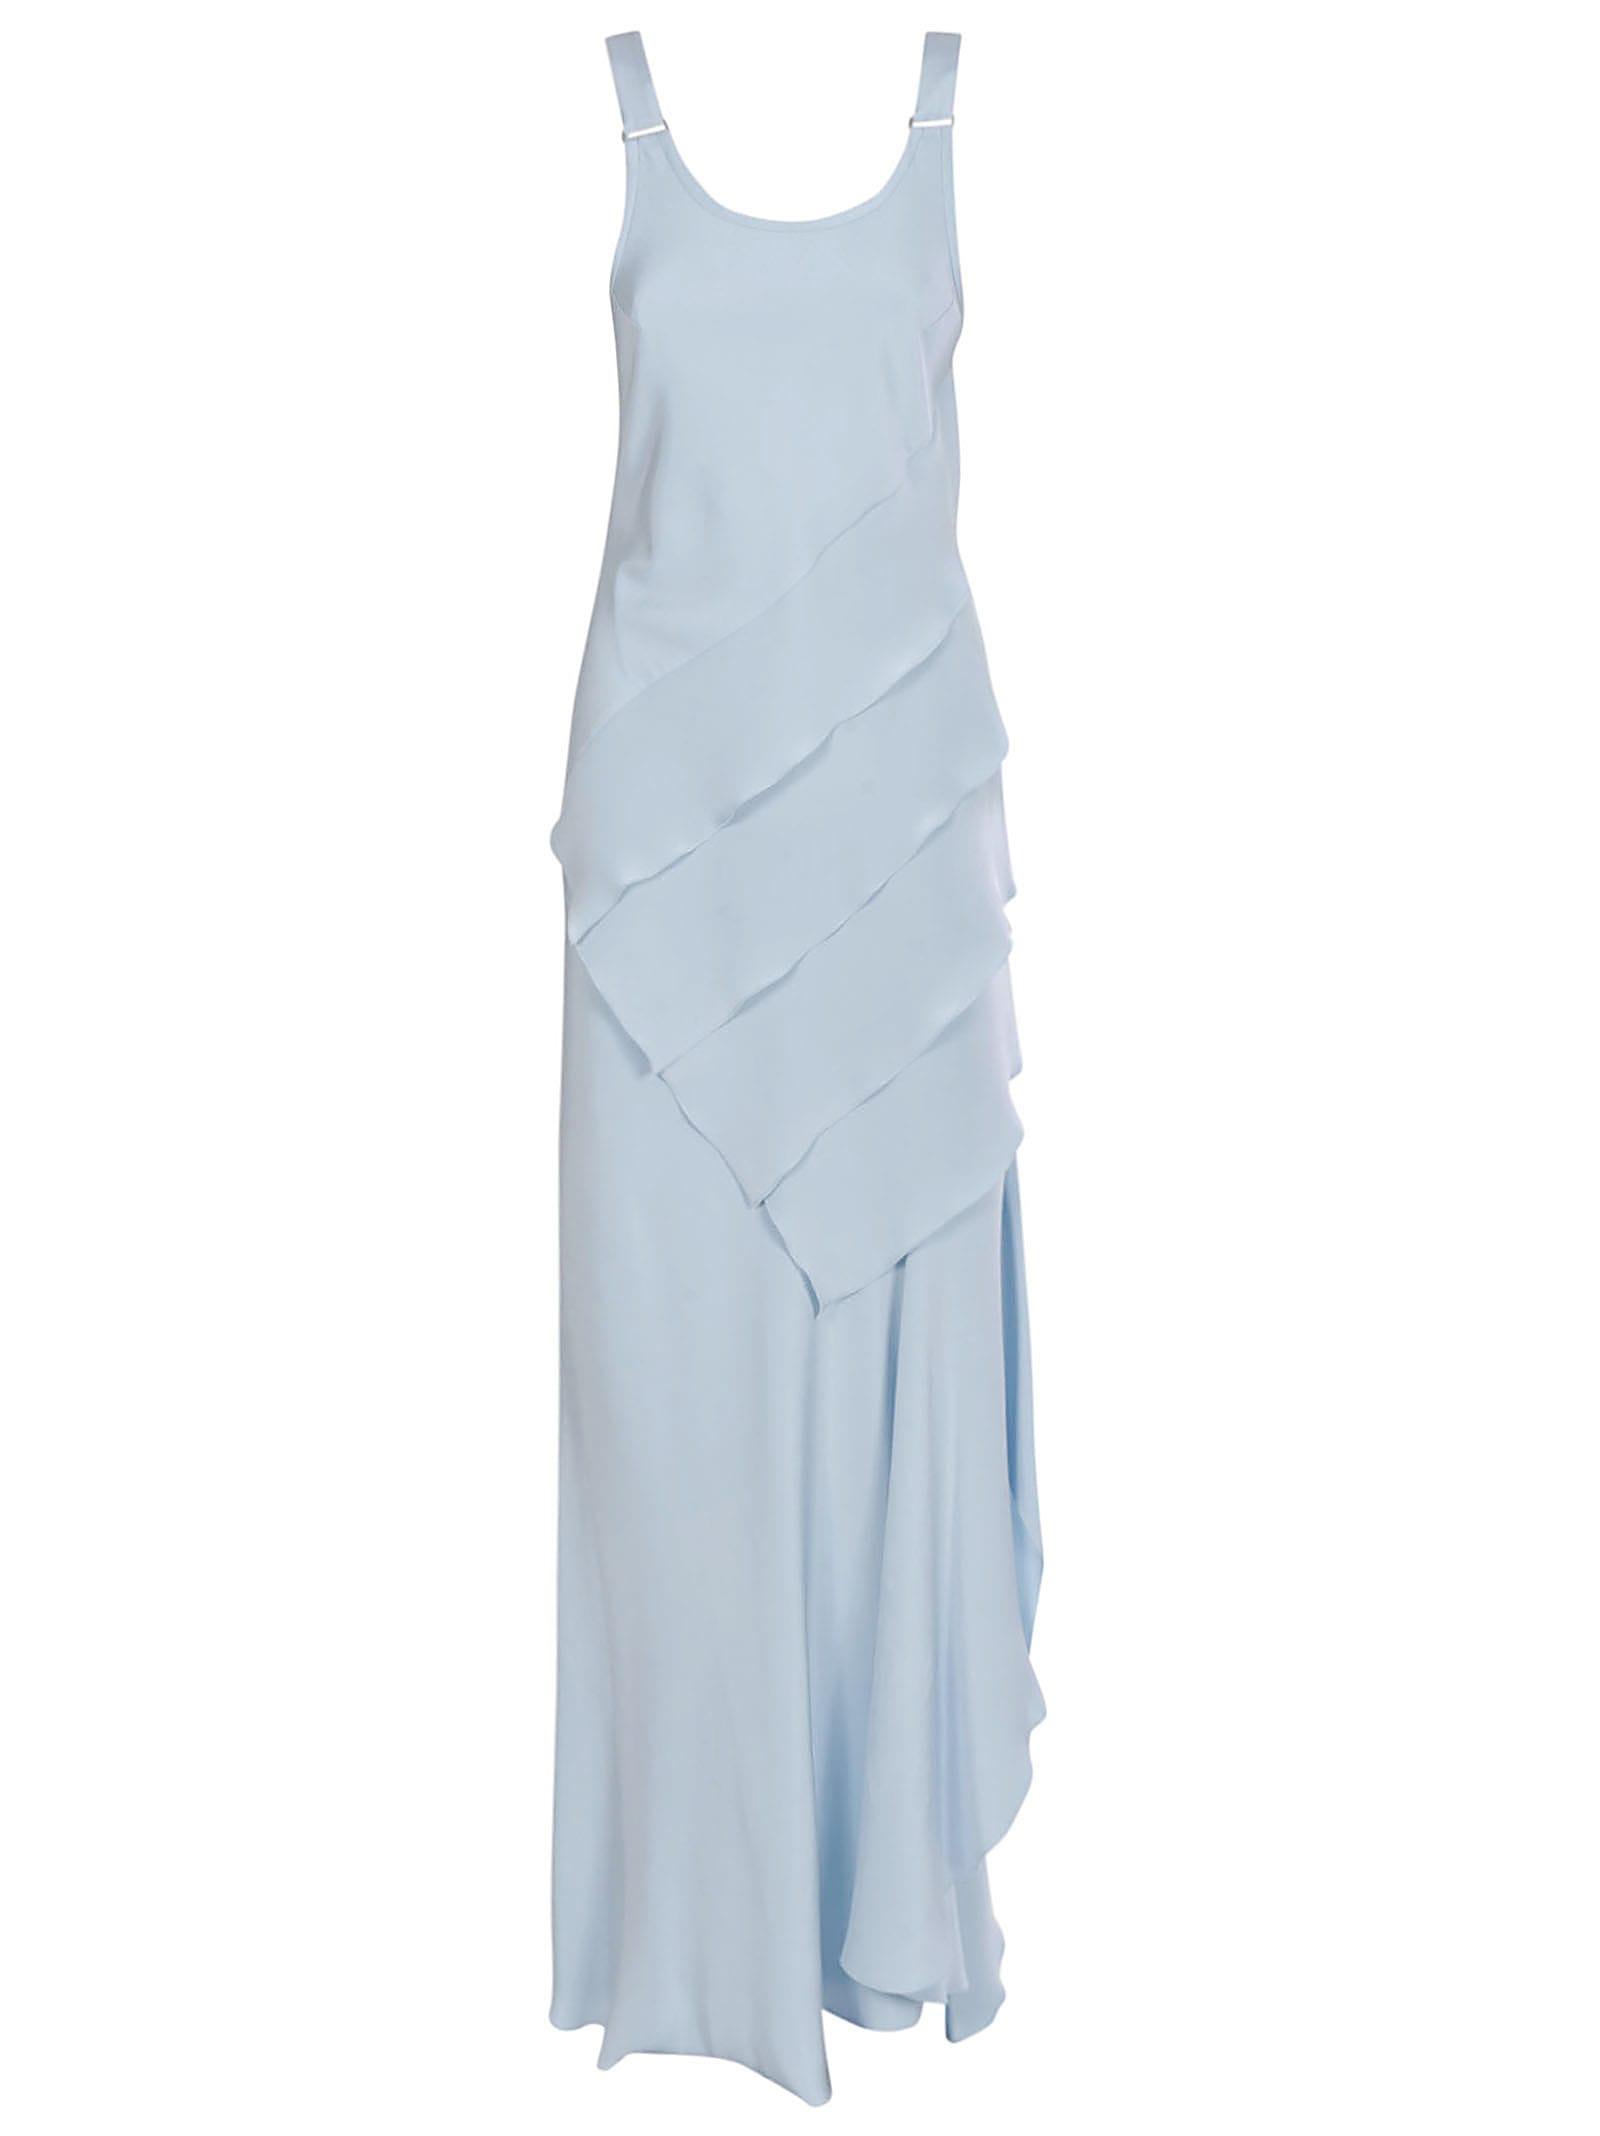 Buy Max Mara Sleeveless Maxi Dress online, shop Max Mara with free shipping